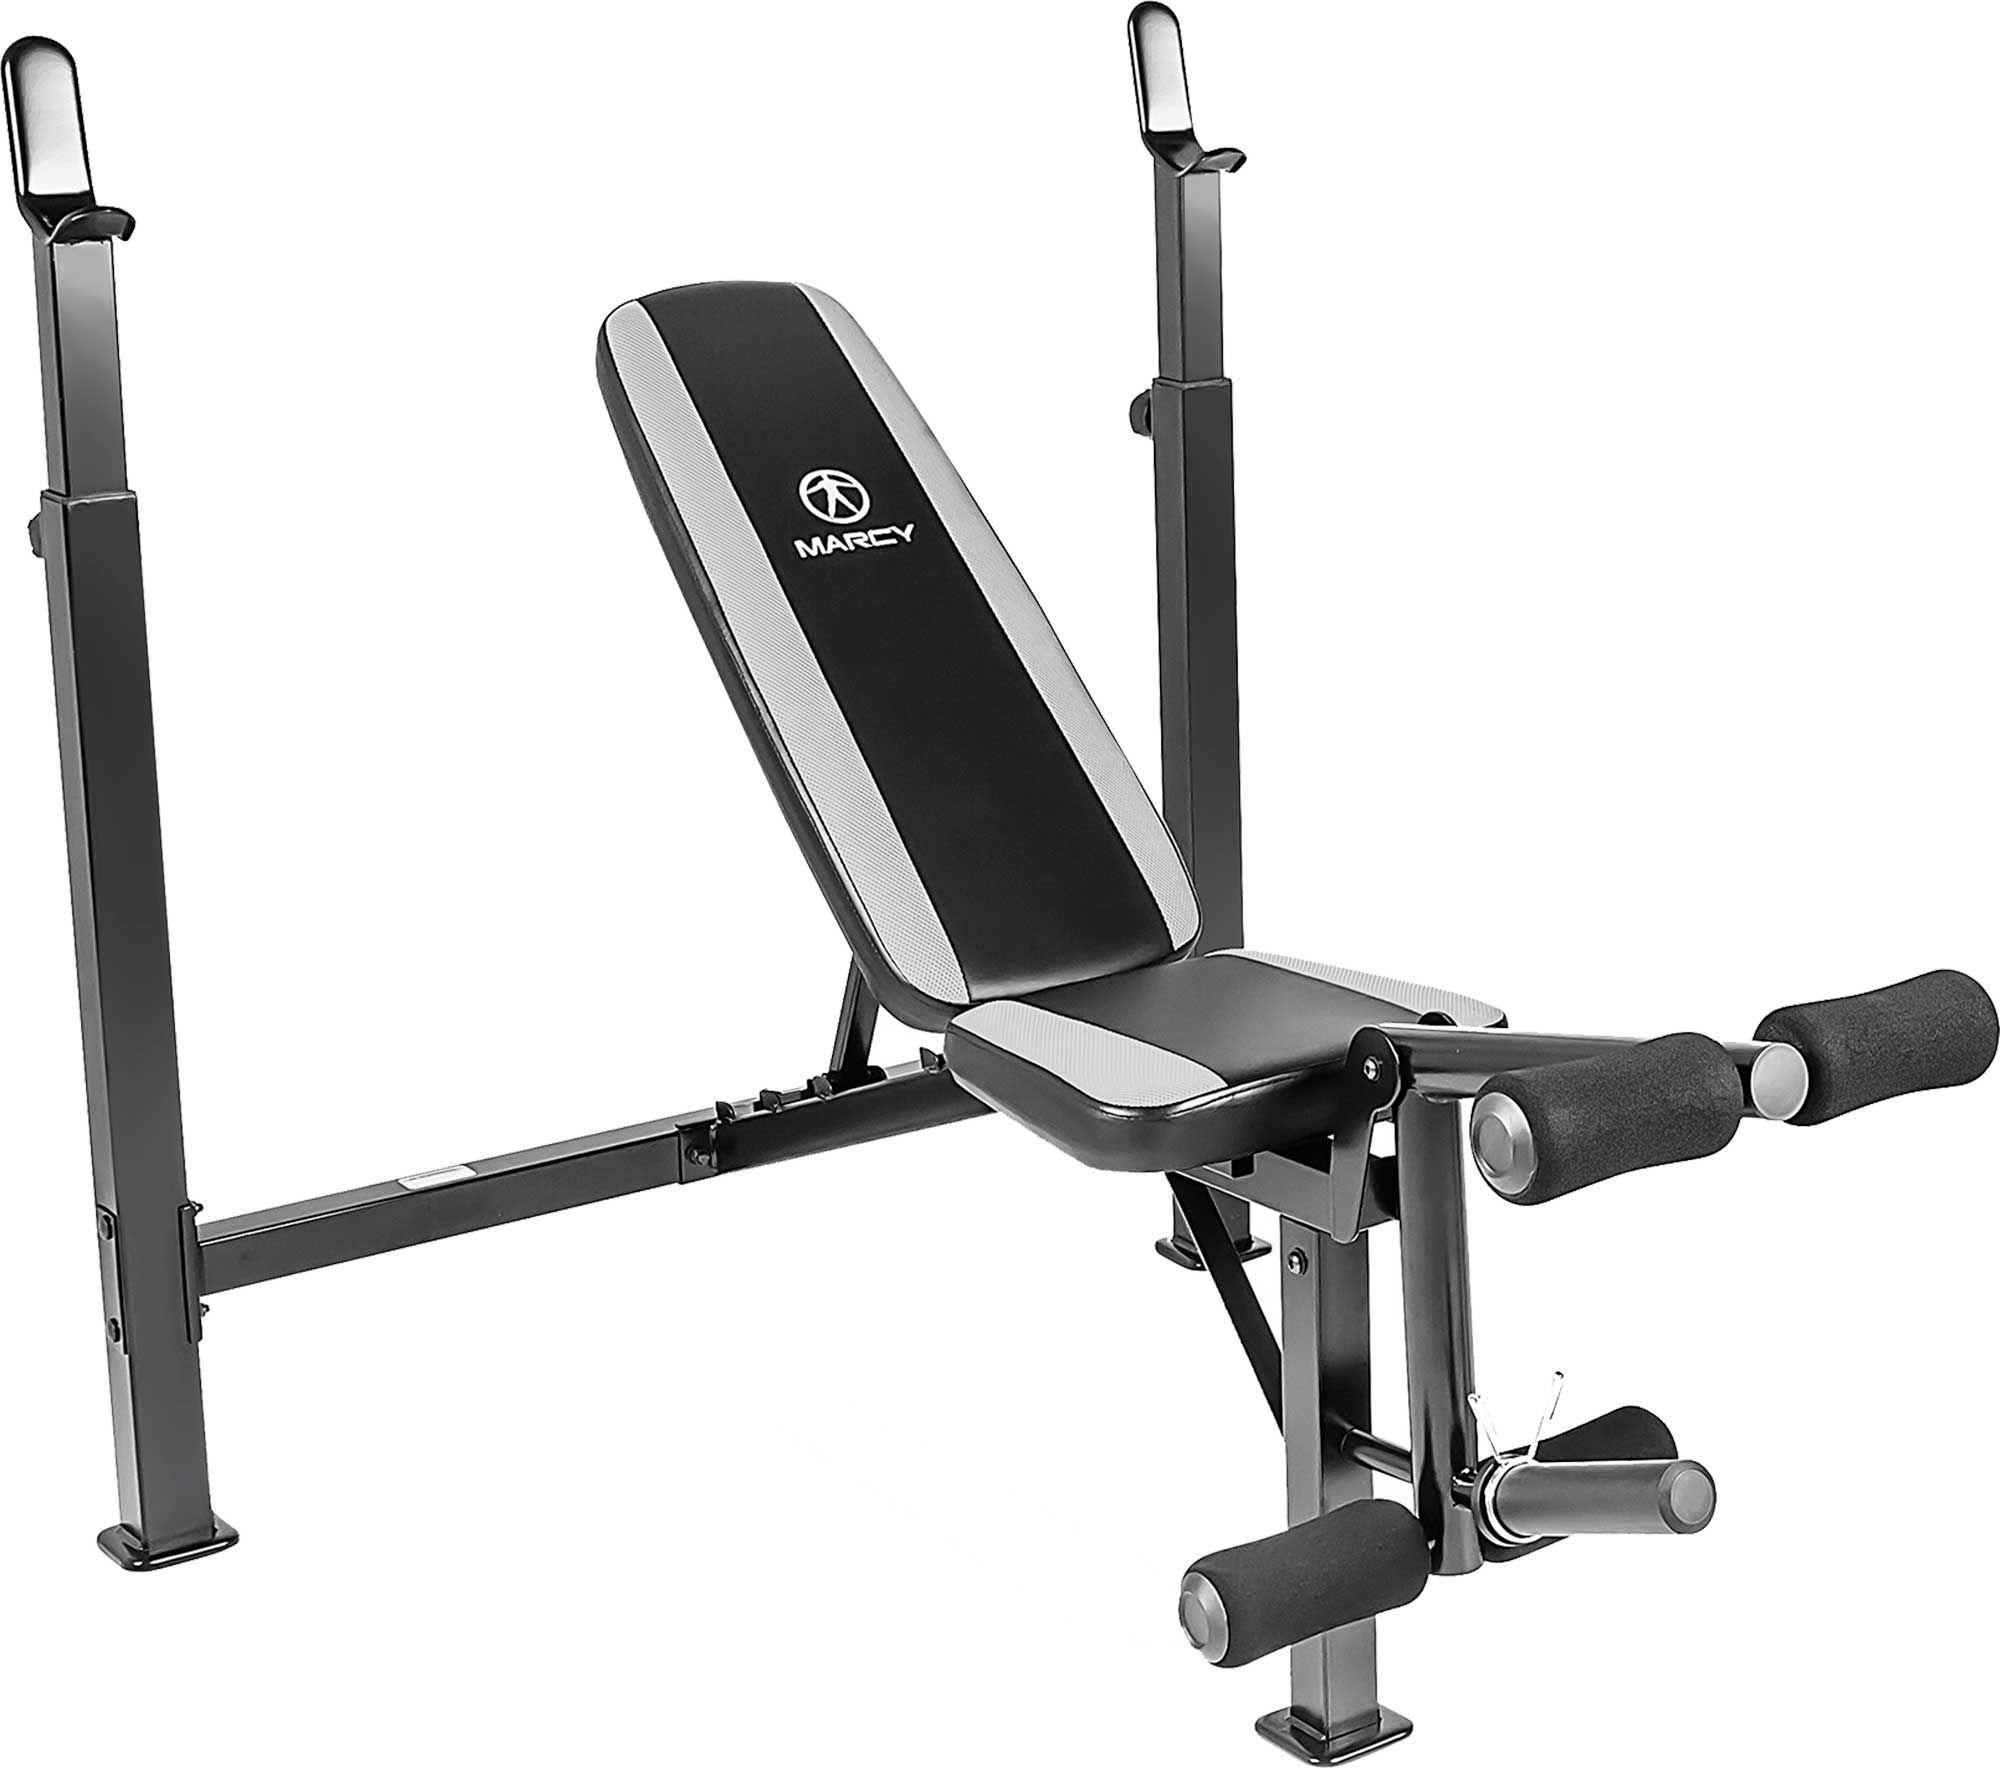 bodyworks bodyworx weight foldable bench olympic benches